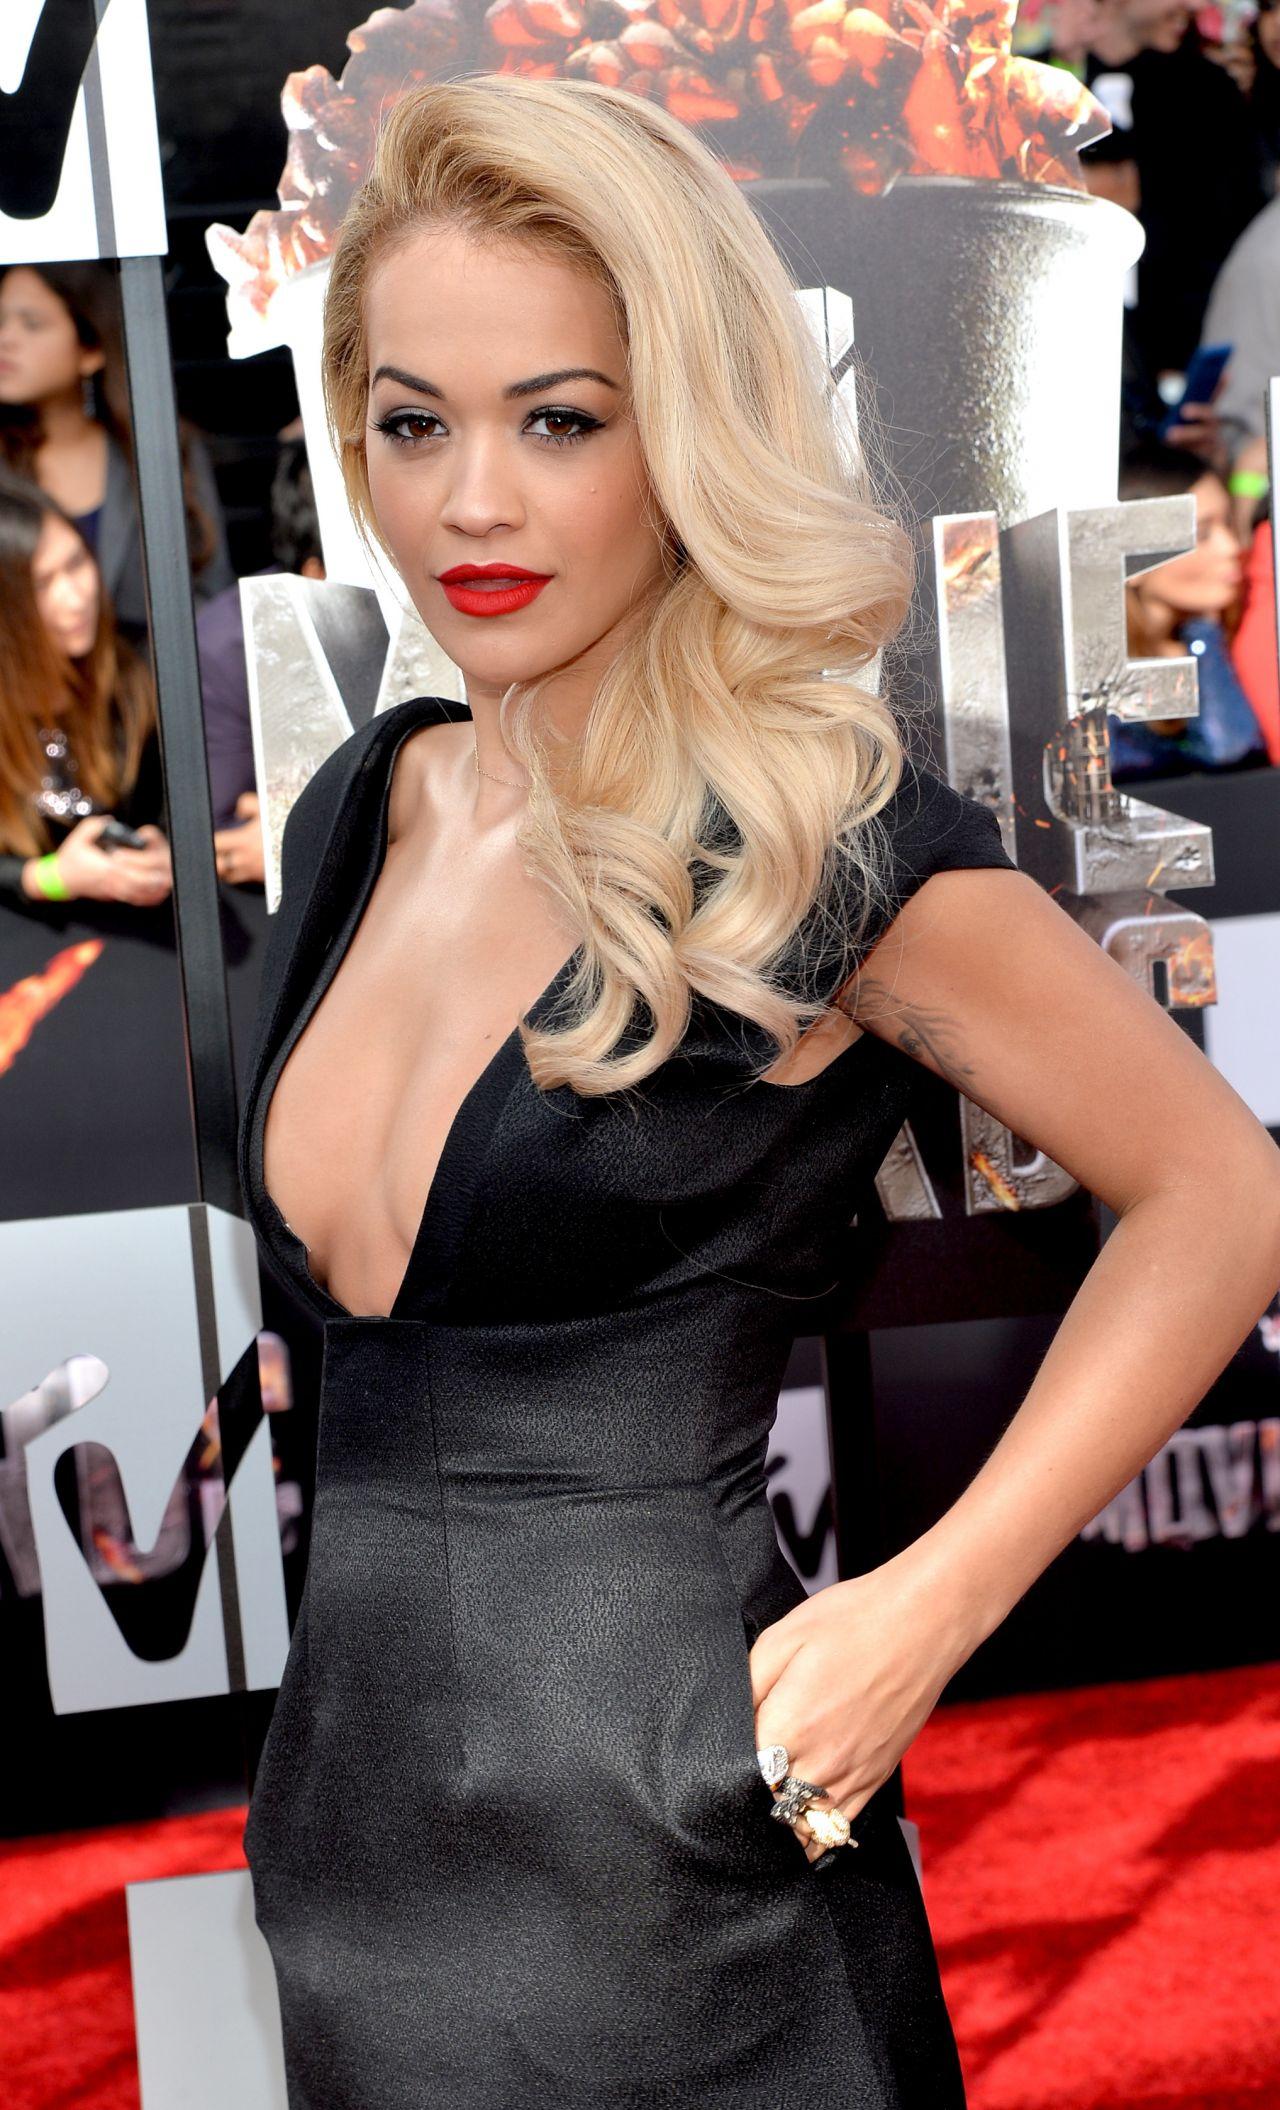 Rita Ora Fashion Shoot Photos: Rita Ora Wearing Barbara Casasola Black Dress